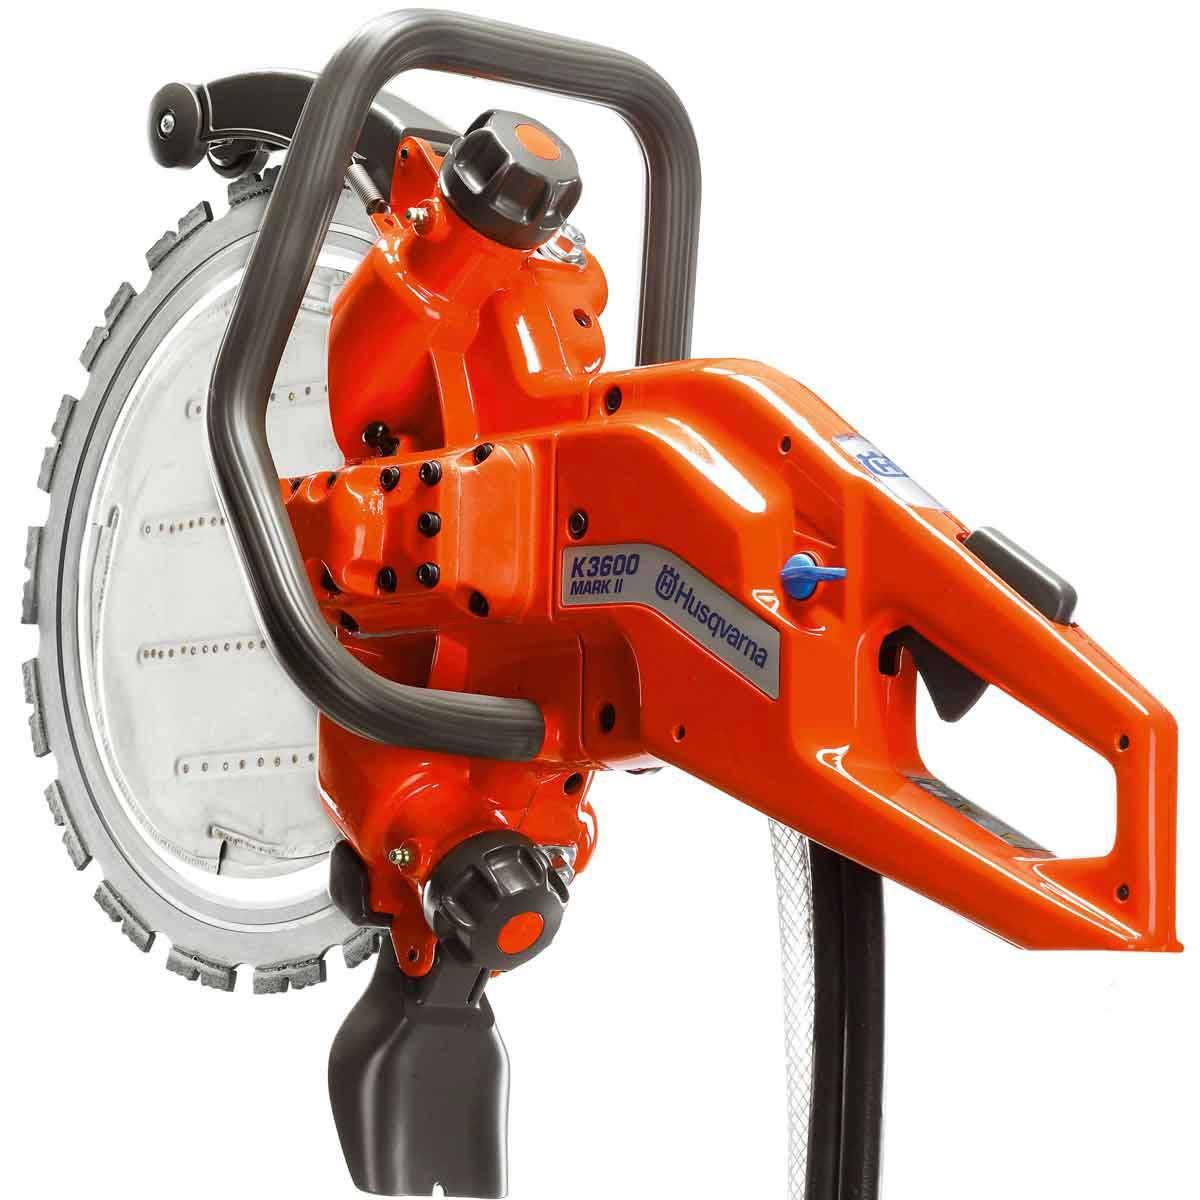 Husqvarna K3600 MK II Hydraulic saw